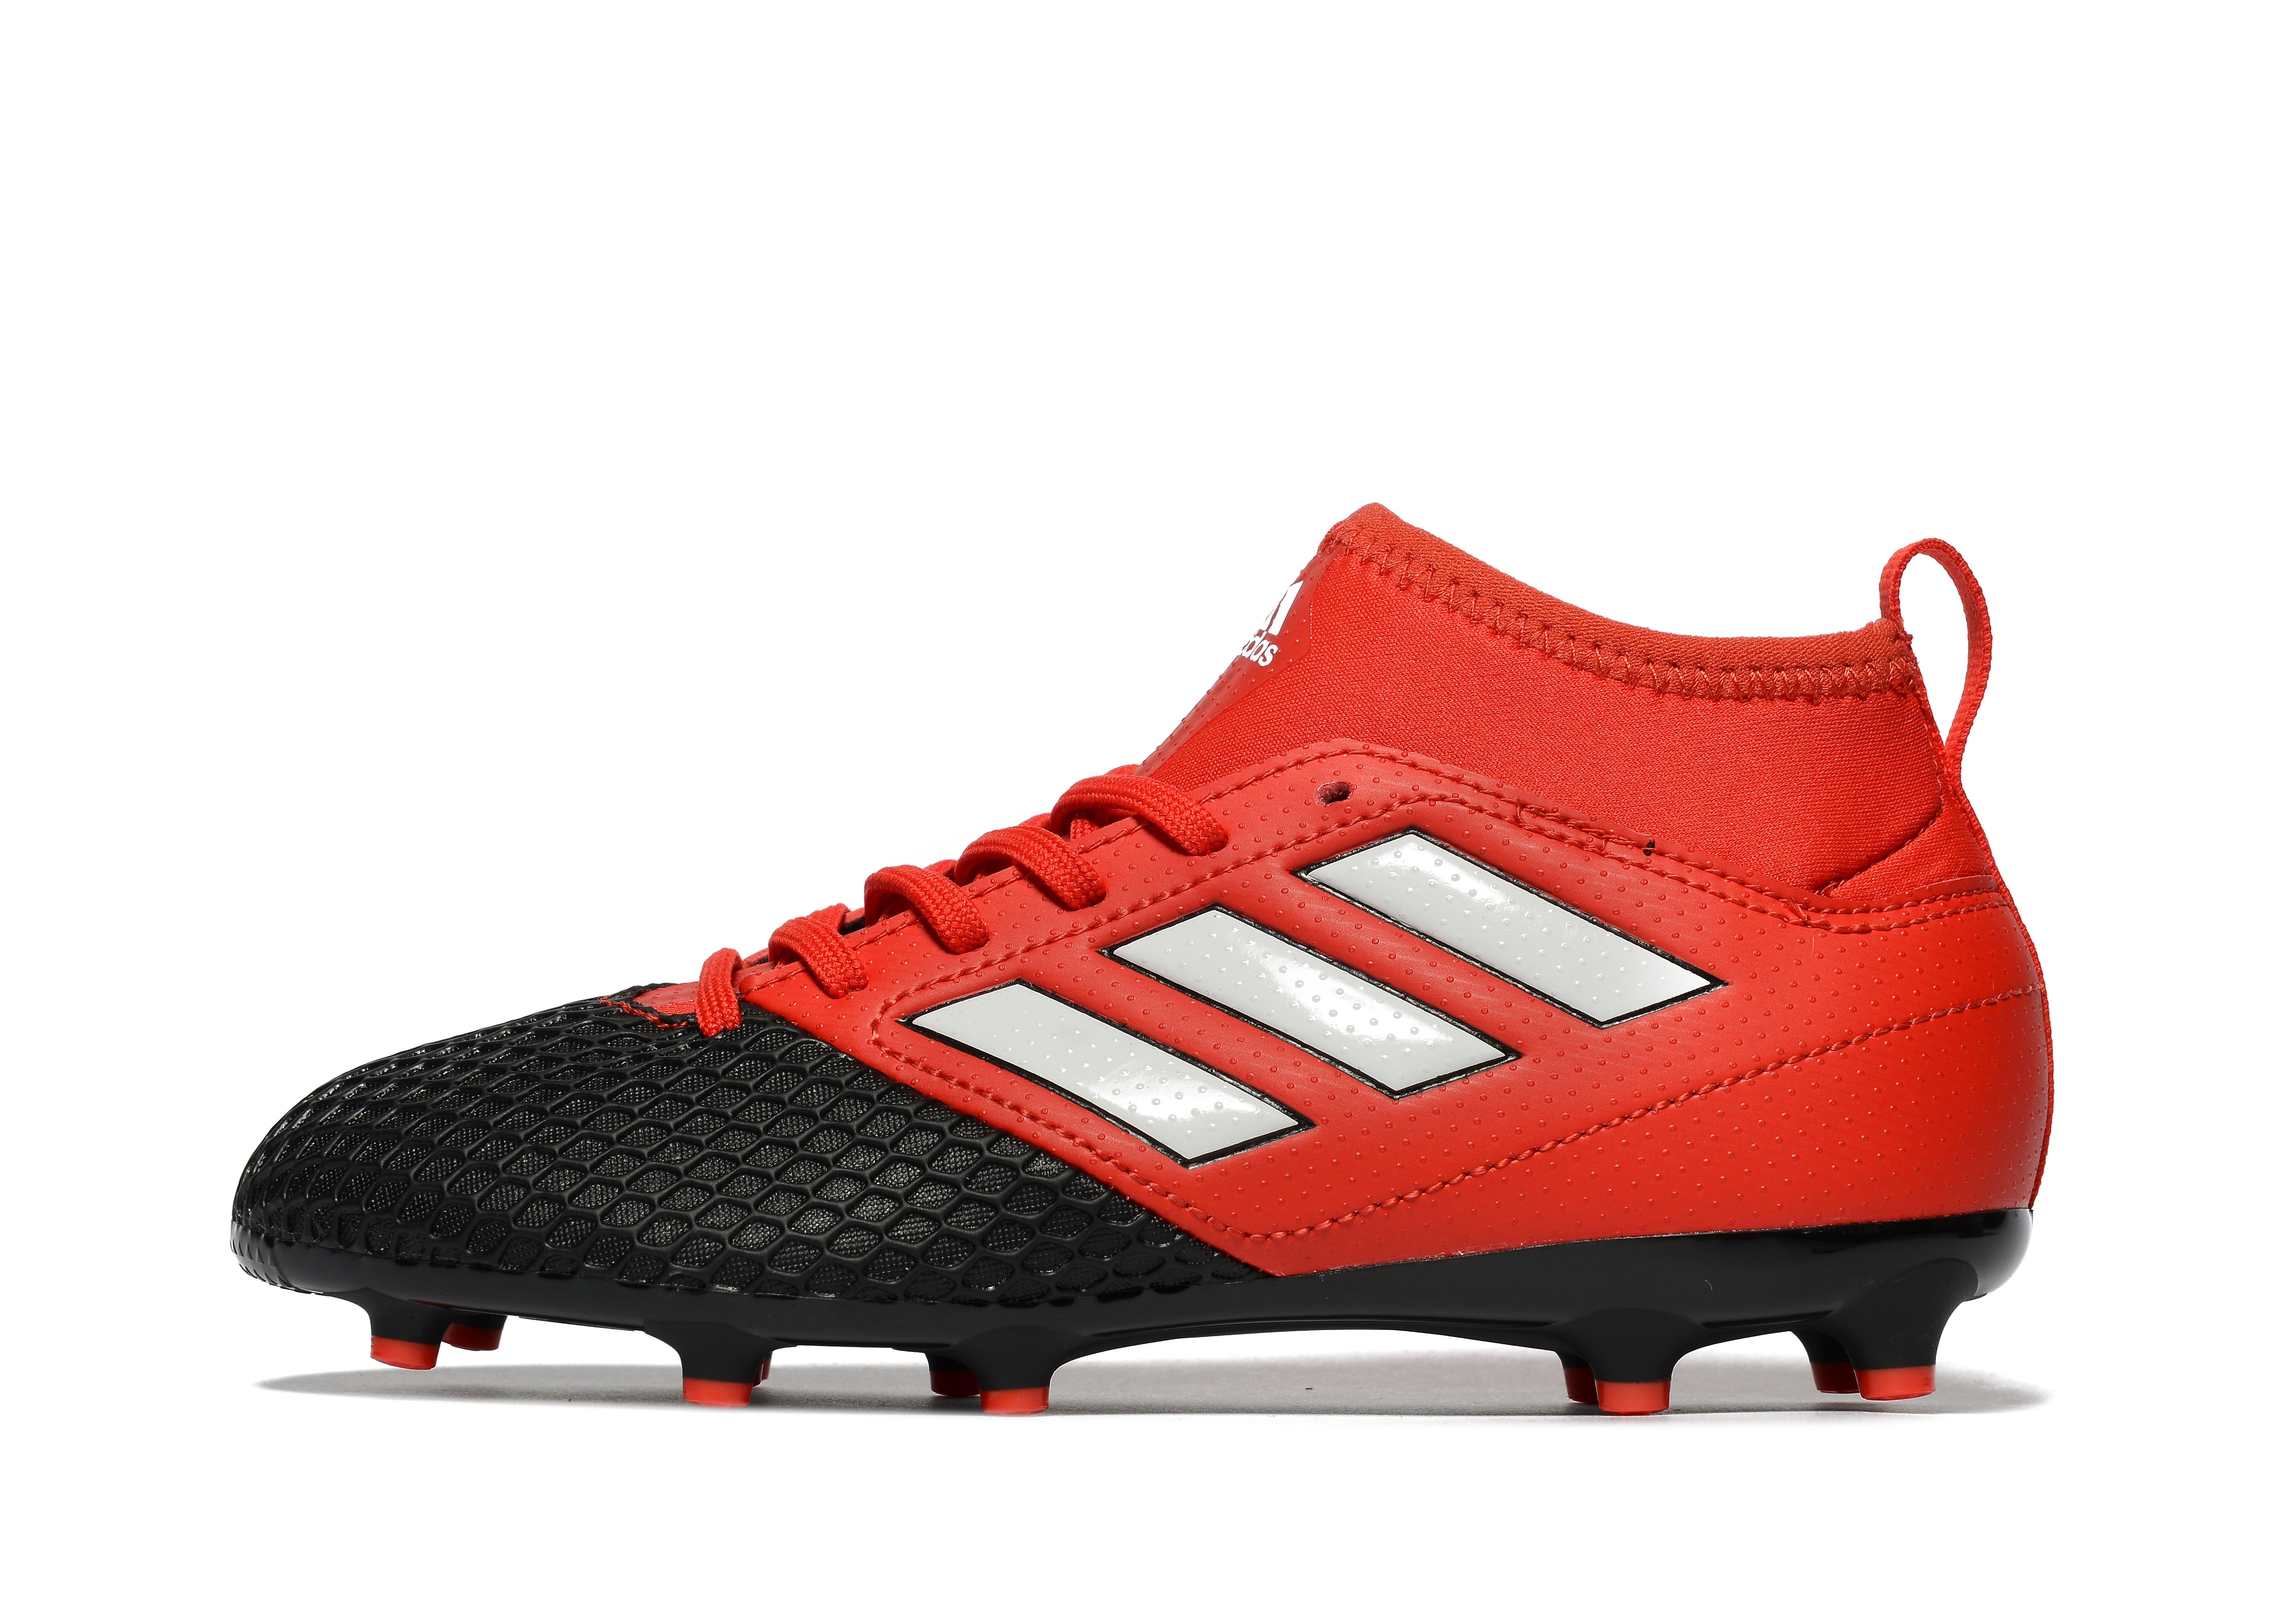 adidas Red Limit ACE 17.3 Primemesh FG Children